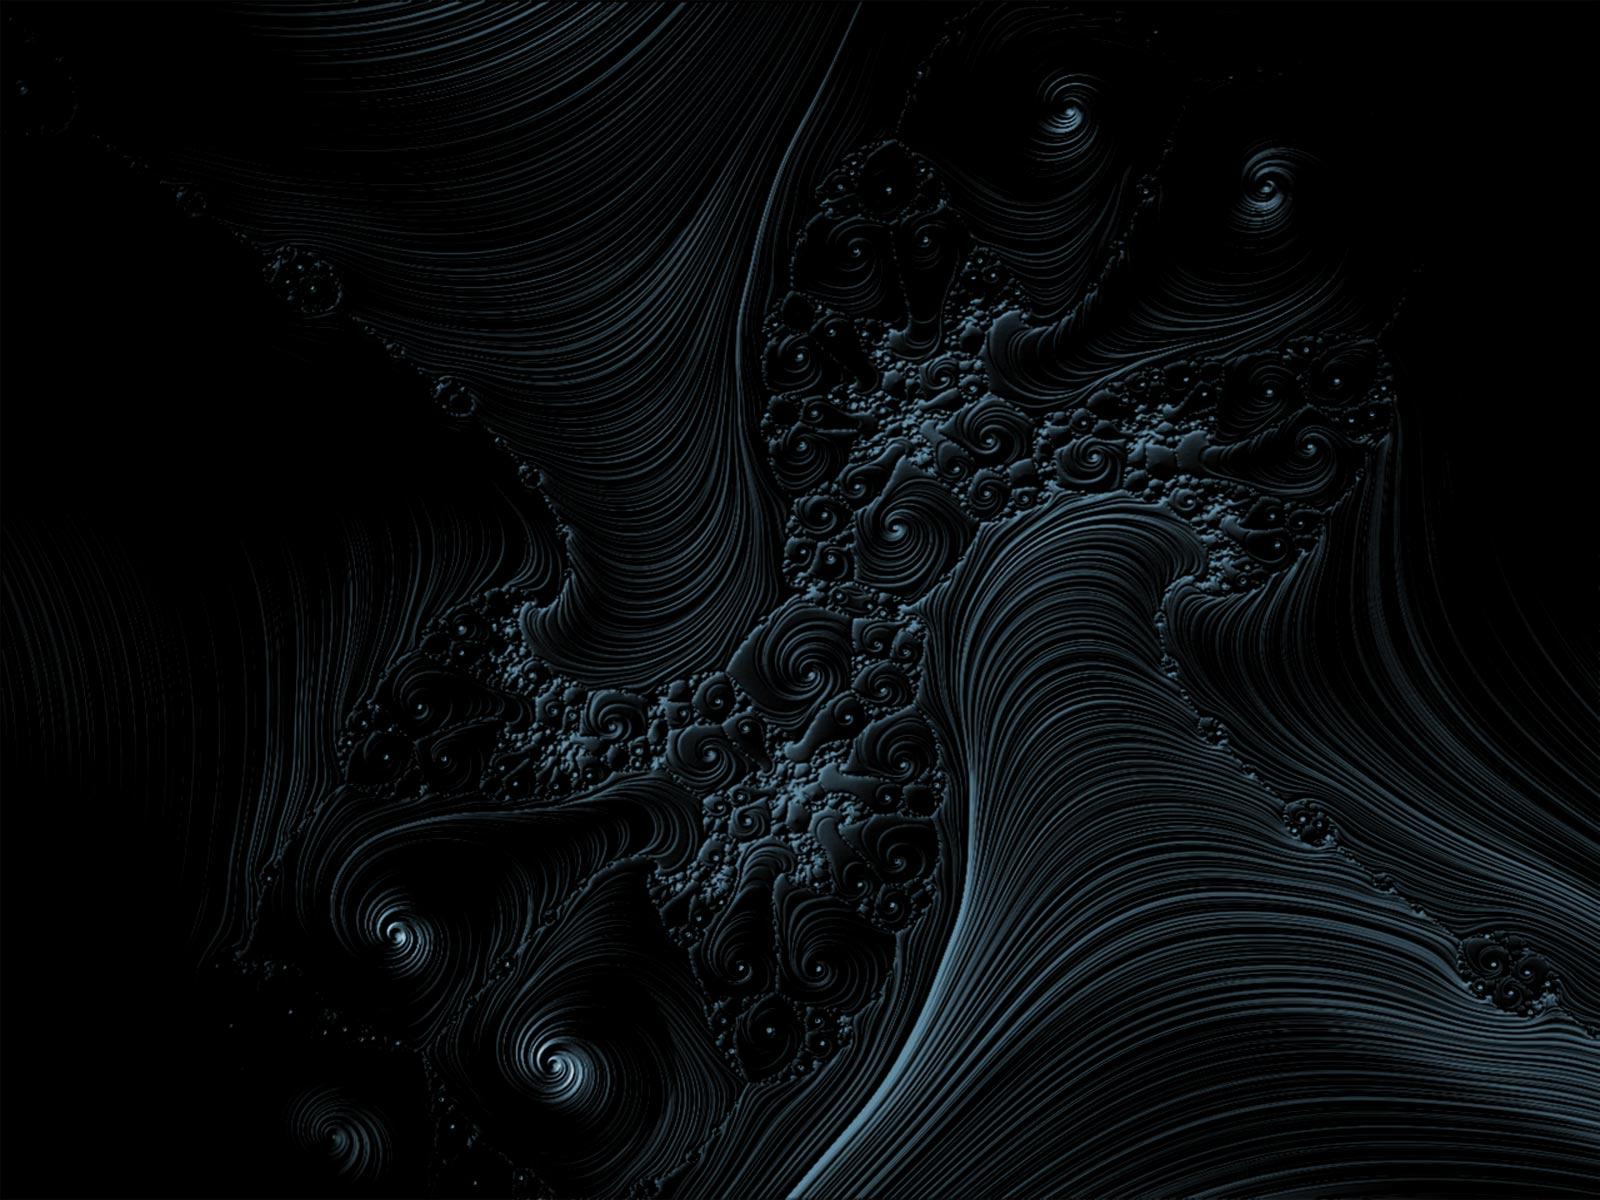 http://1.bp.blogspot.com/-xLU0bcVMy7Y/Texc-ul0JlI/AAAAAAAAApI/zL_autVDA9U/s1600/twister-fractal-dark.jpg